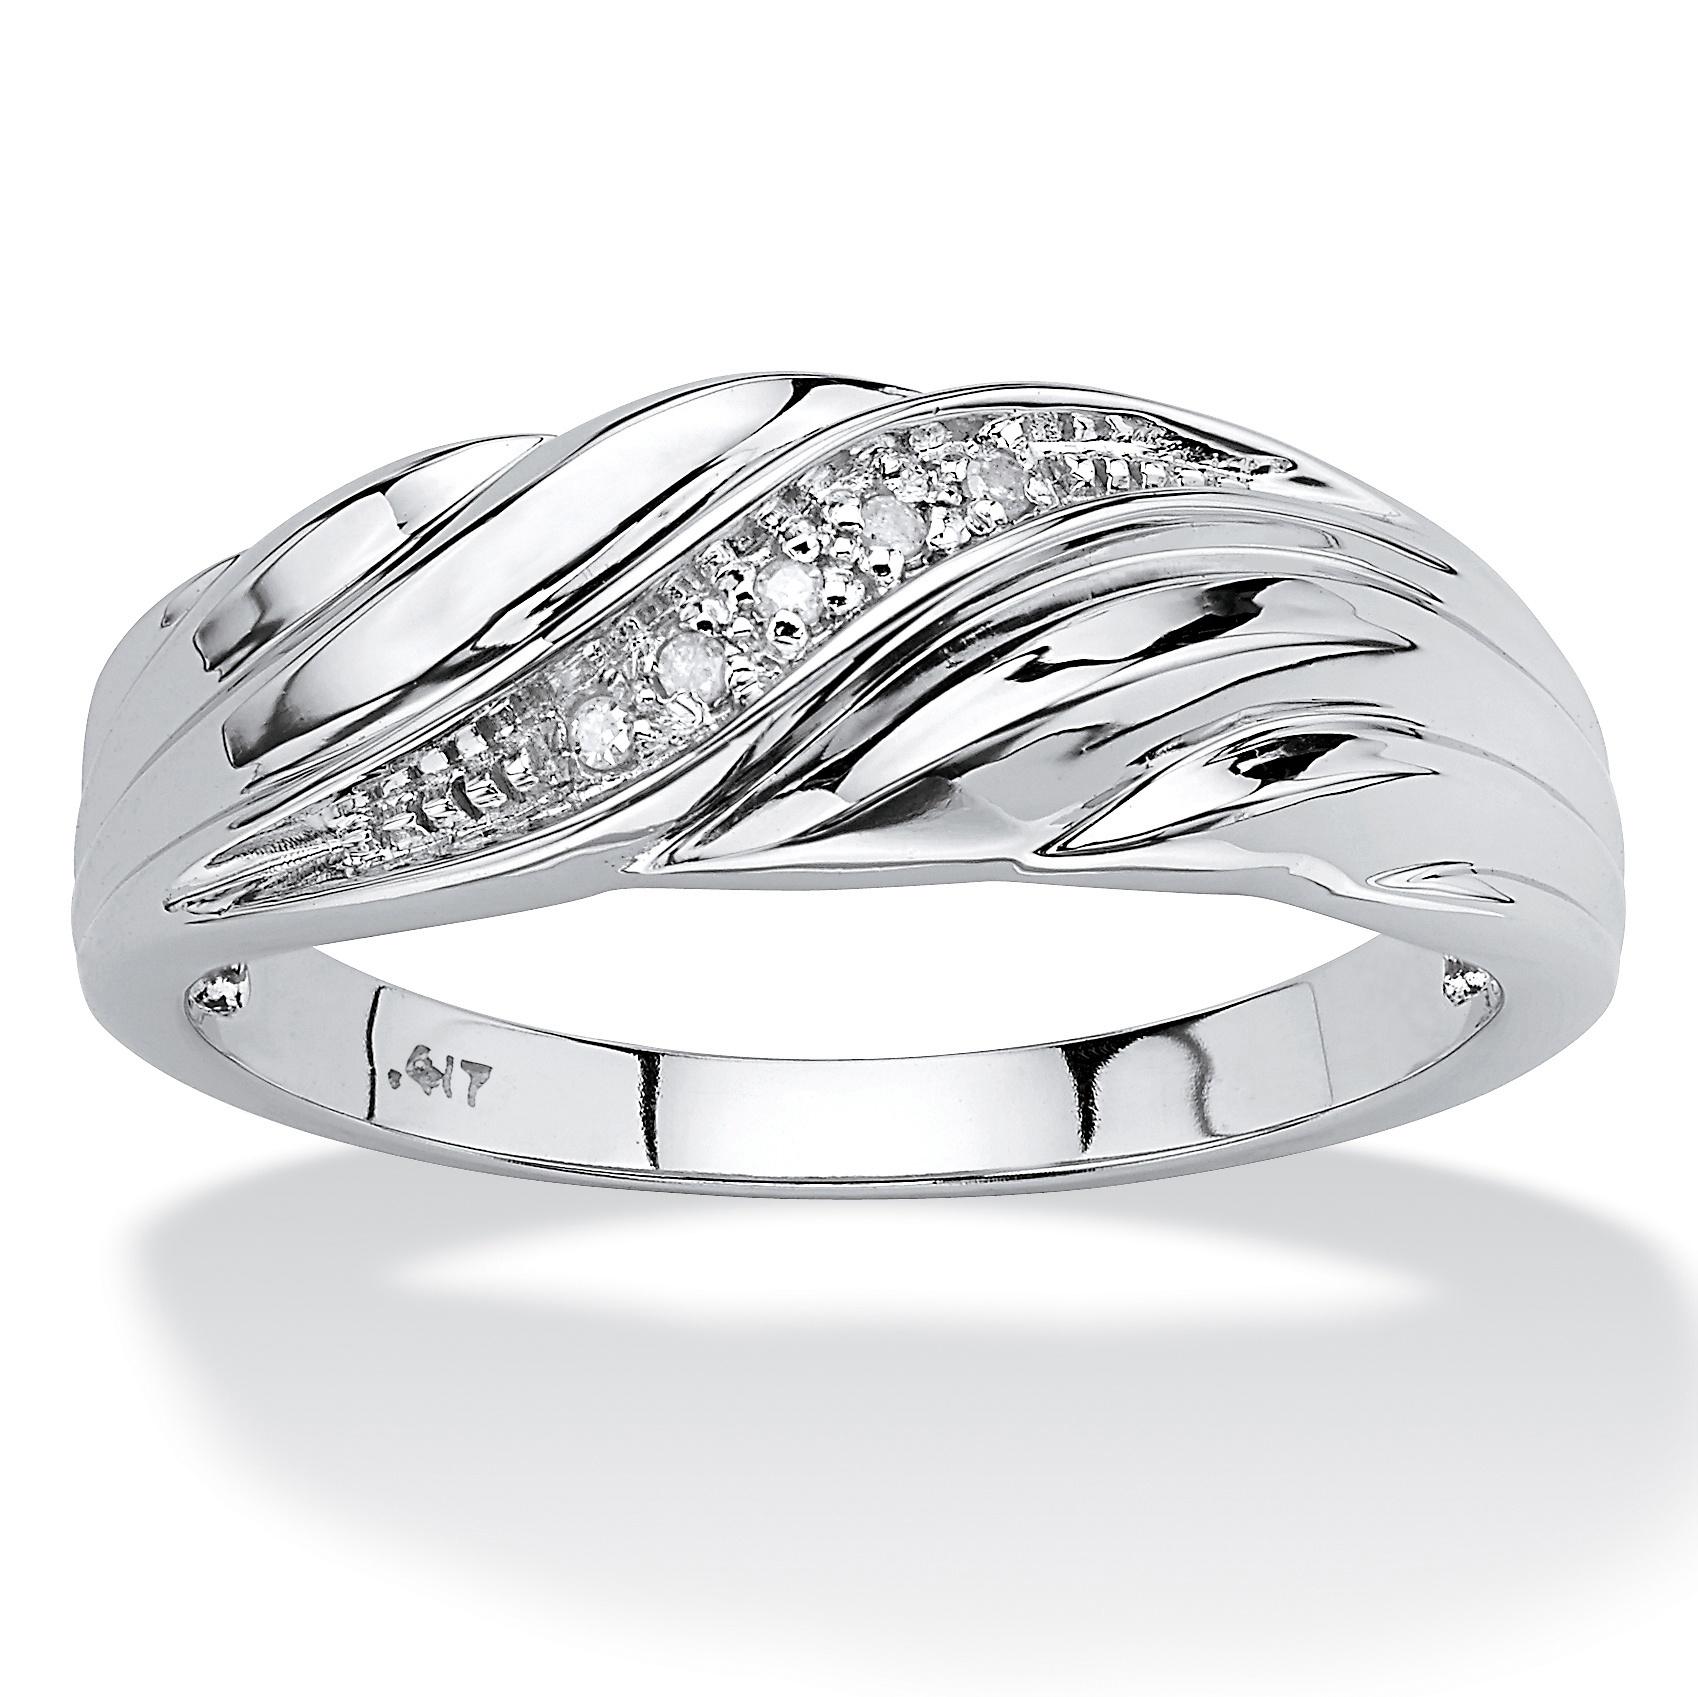 PalmBeach Men's Diamond Accent Solid 10k White Gold Swirl...